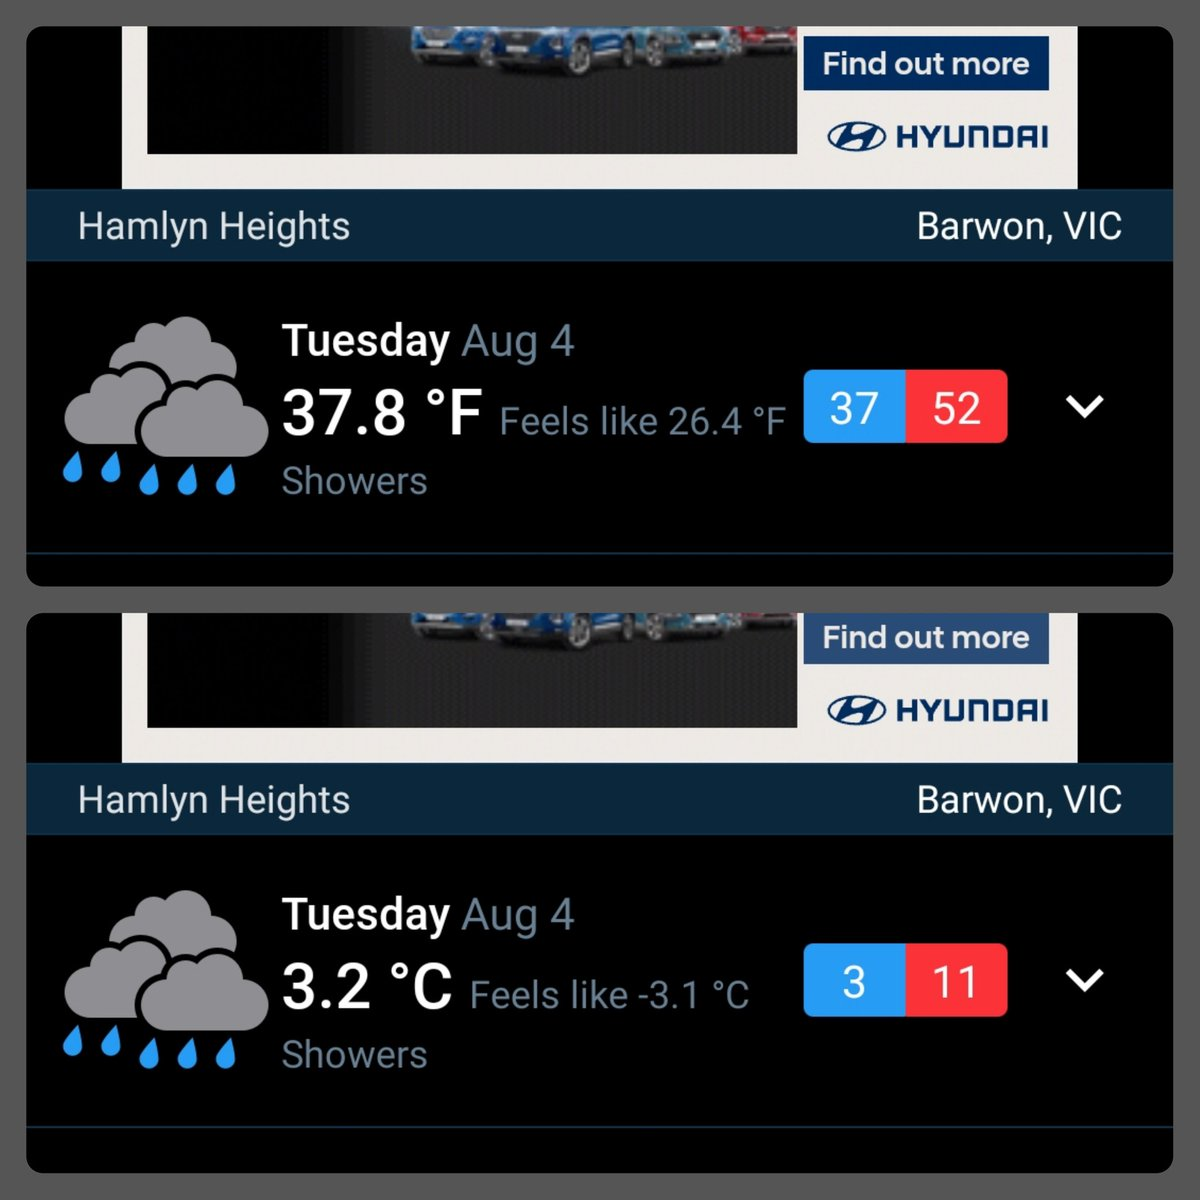 Ouch. It's 3.2°C/37.8°F but with the wind chill it feels like -3.1°C/26.4°F  #australianwinter #winter pic.twitter.com/u8f4CqdJdV